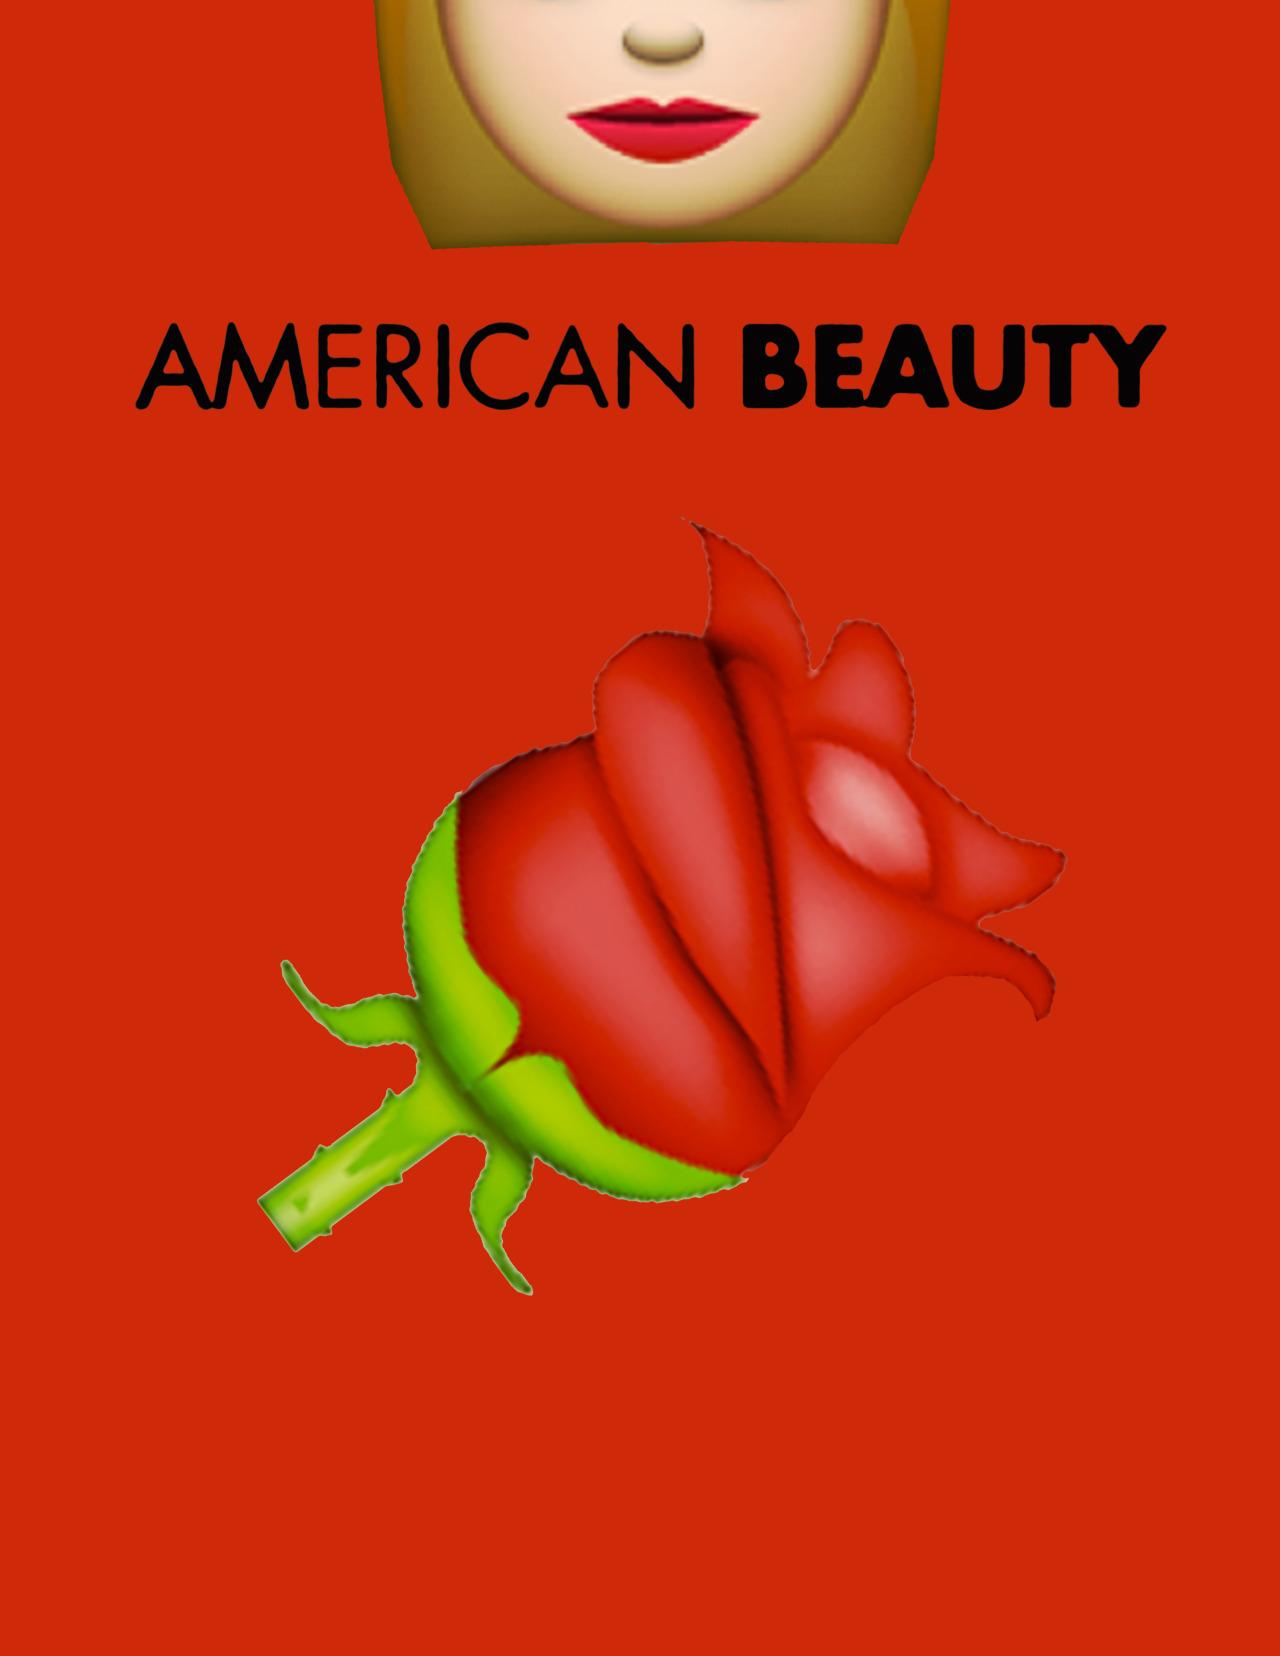 Красота по-американски, Сэм Мендес